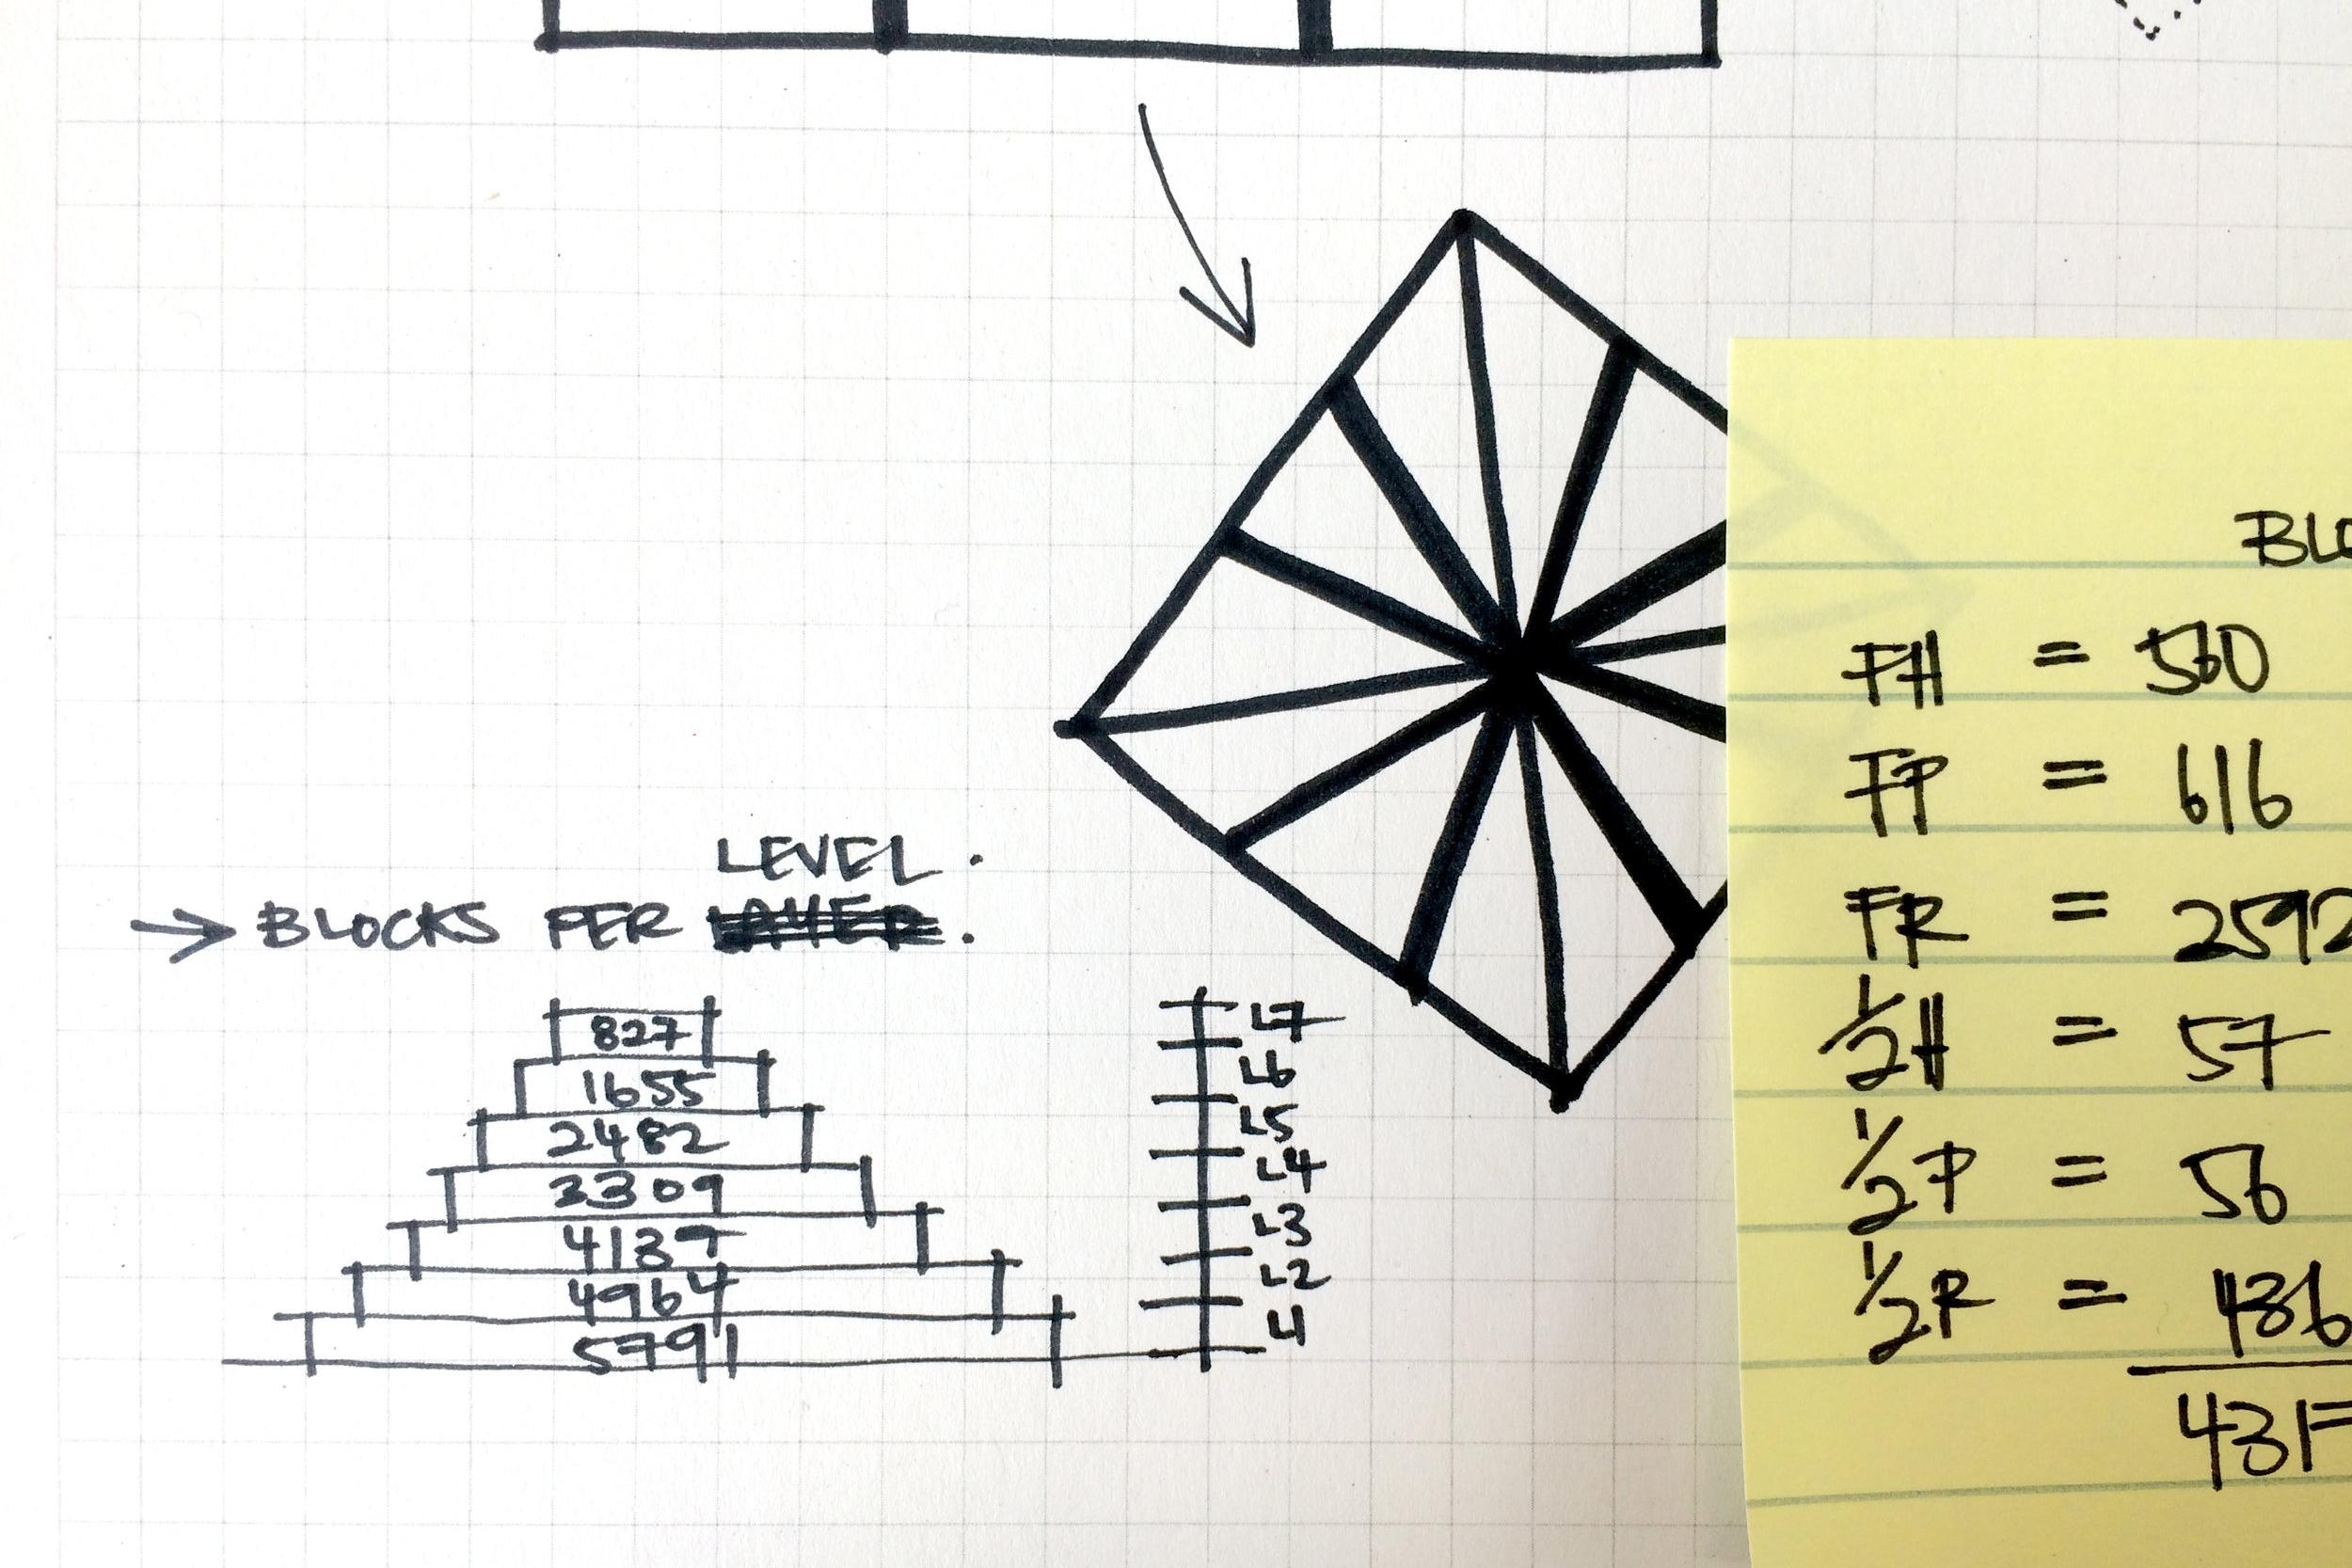 Pyramid-progress_06.JPG